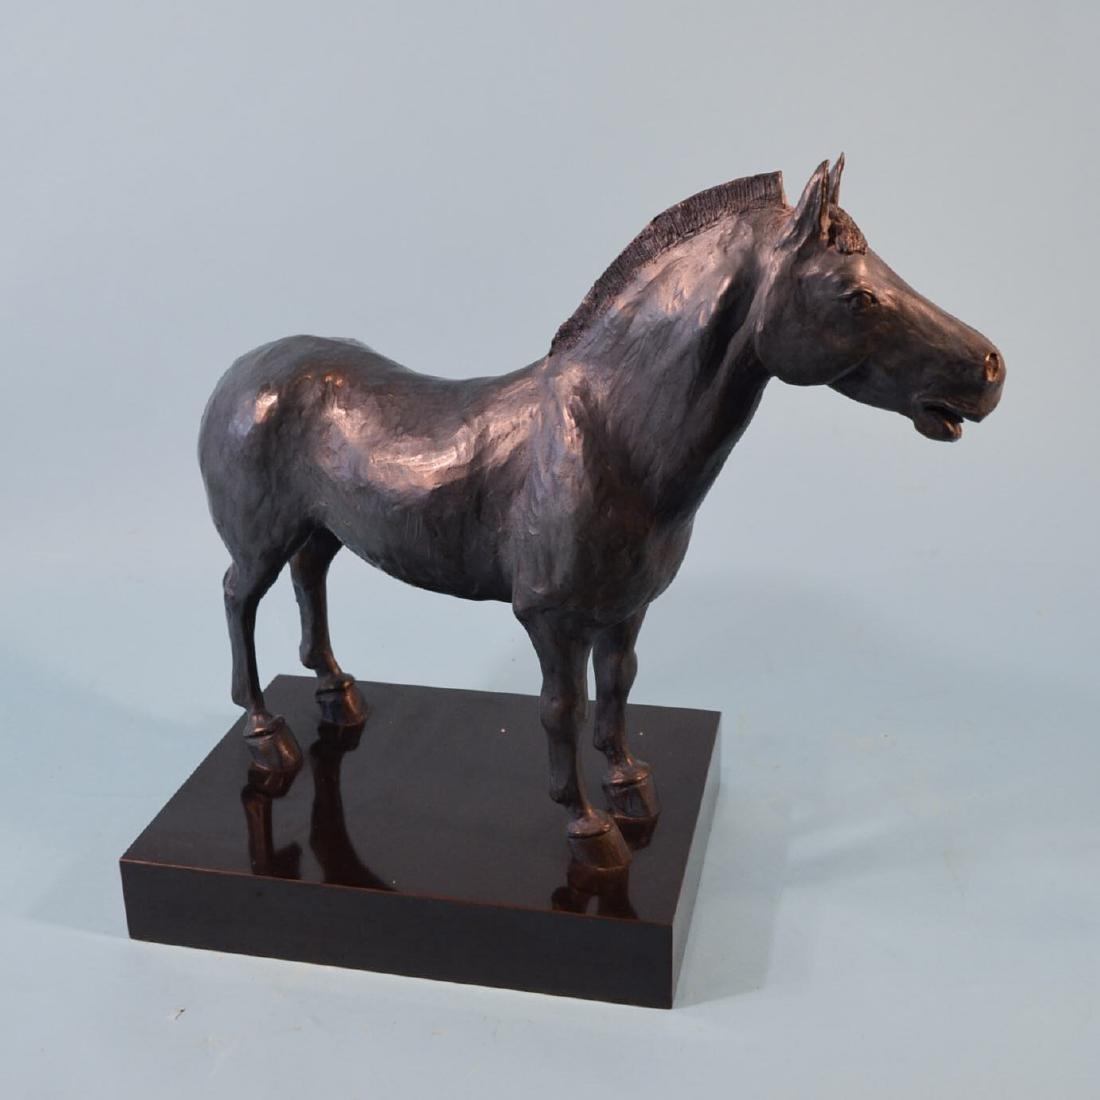 Illegibly Signed 1985 Signed Bronze Horse